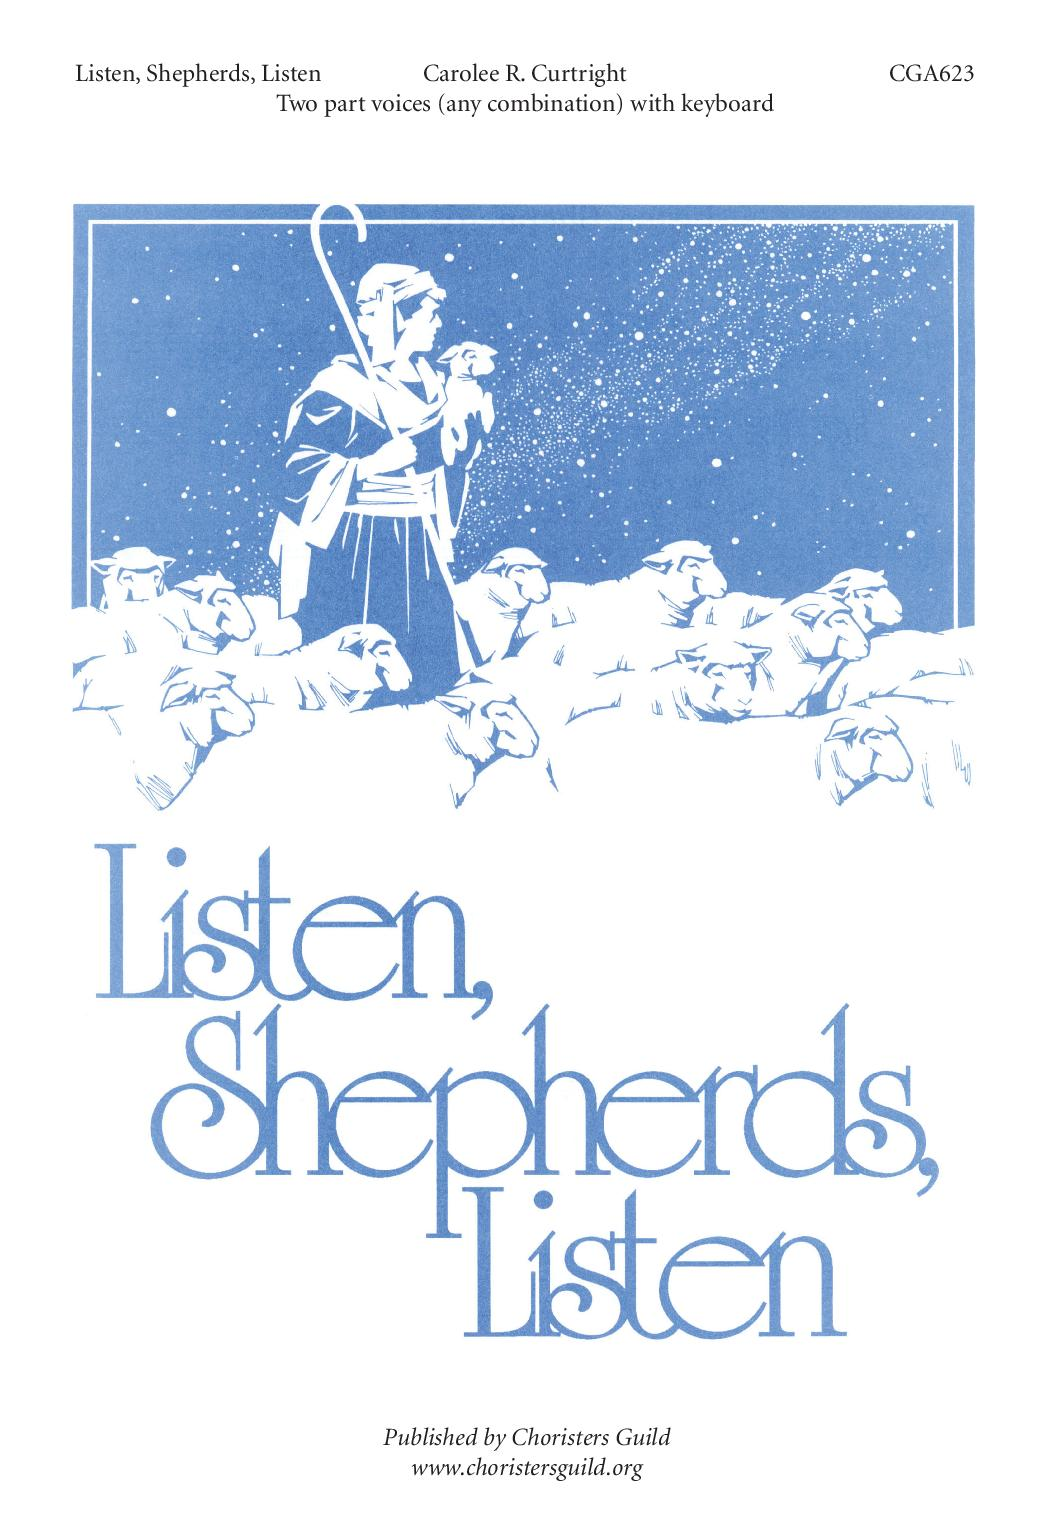 Listen, Shepherds, Listen